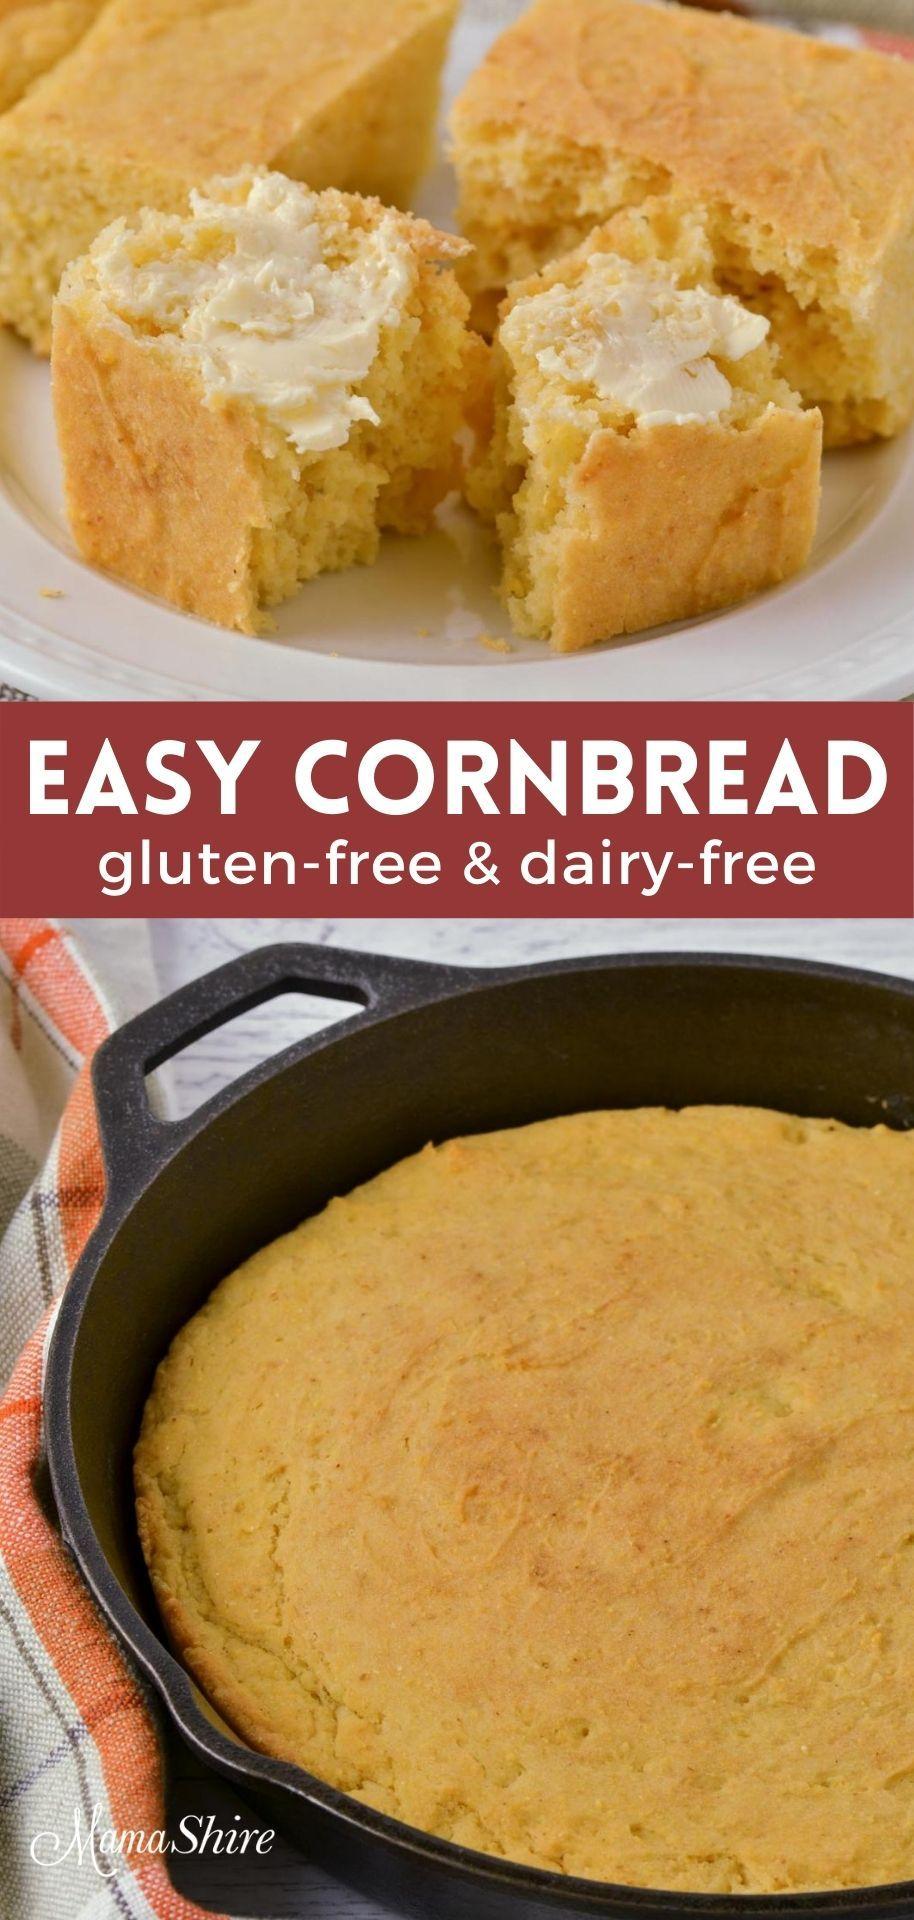 The Best Gluten Free Cornbread Recipe Dairy Free Mamashire Recipe In 2020 Gluten Free Cornbread Gluten Free Cornbread Recipe Dairy Free Recipes